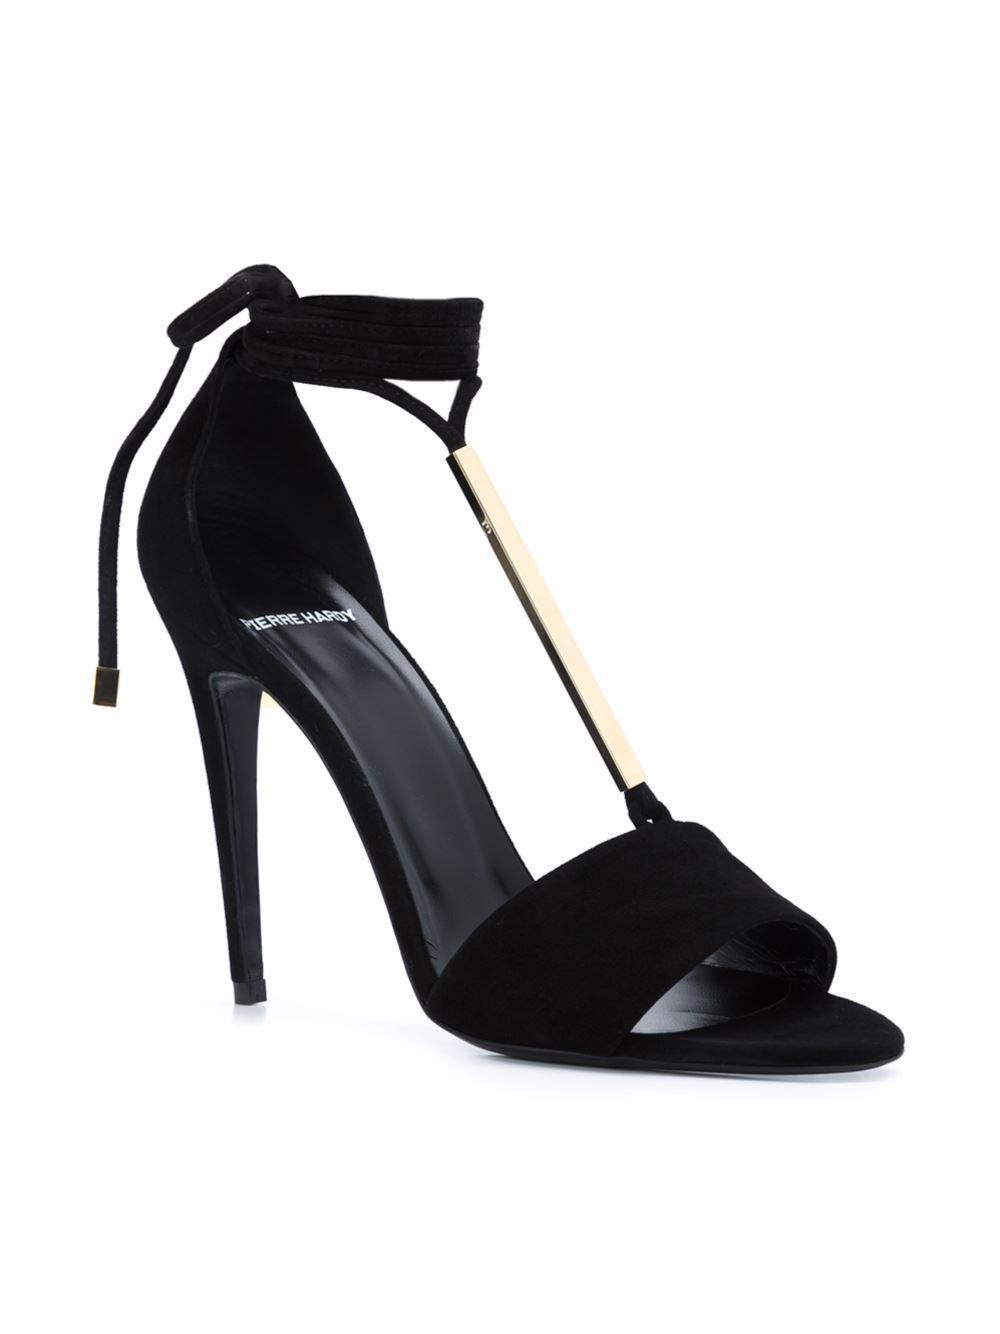 92cdf37e21d Women s Natural  blondie  Sandals